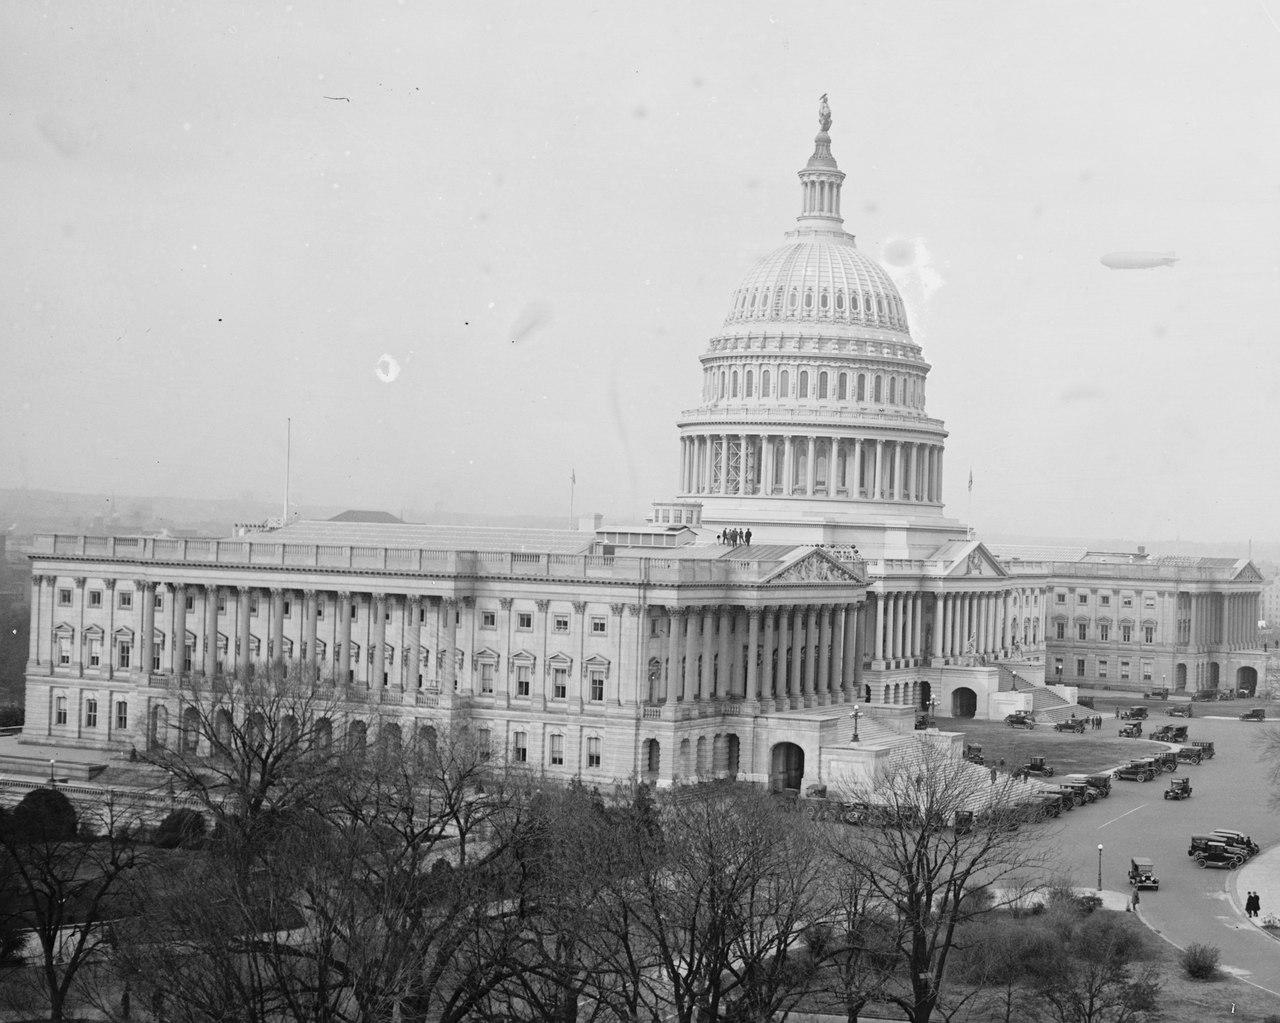 US_Capitol_on_25_November_1924_with_the_USS_Los_Angeles_ZR-3_26474u.jpg